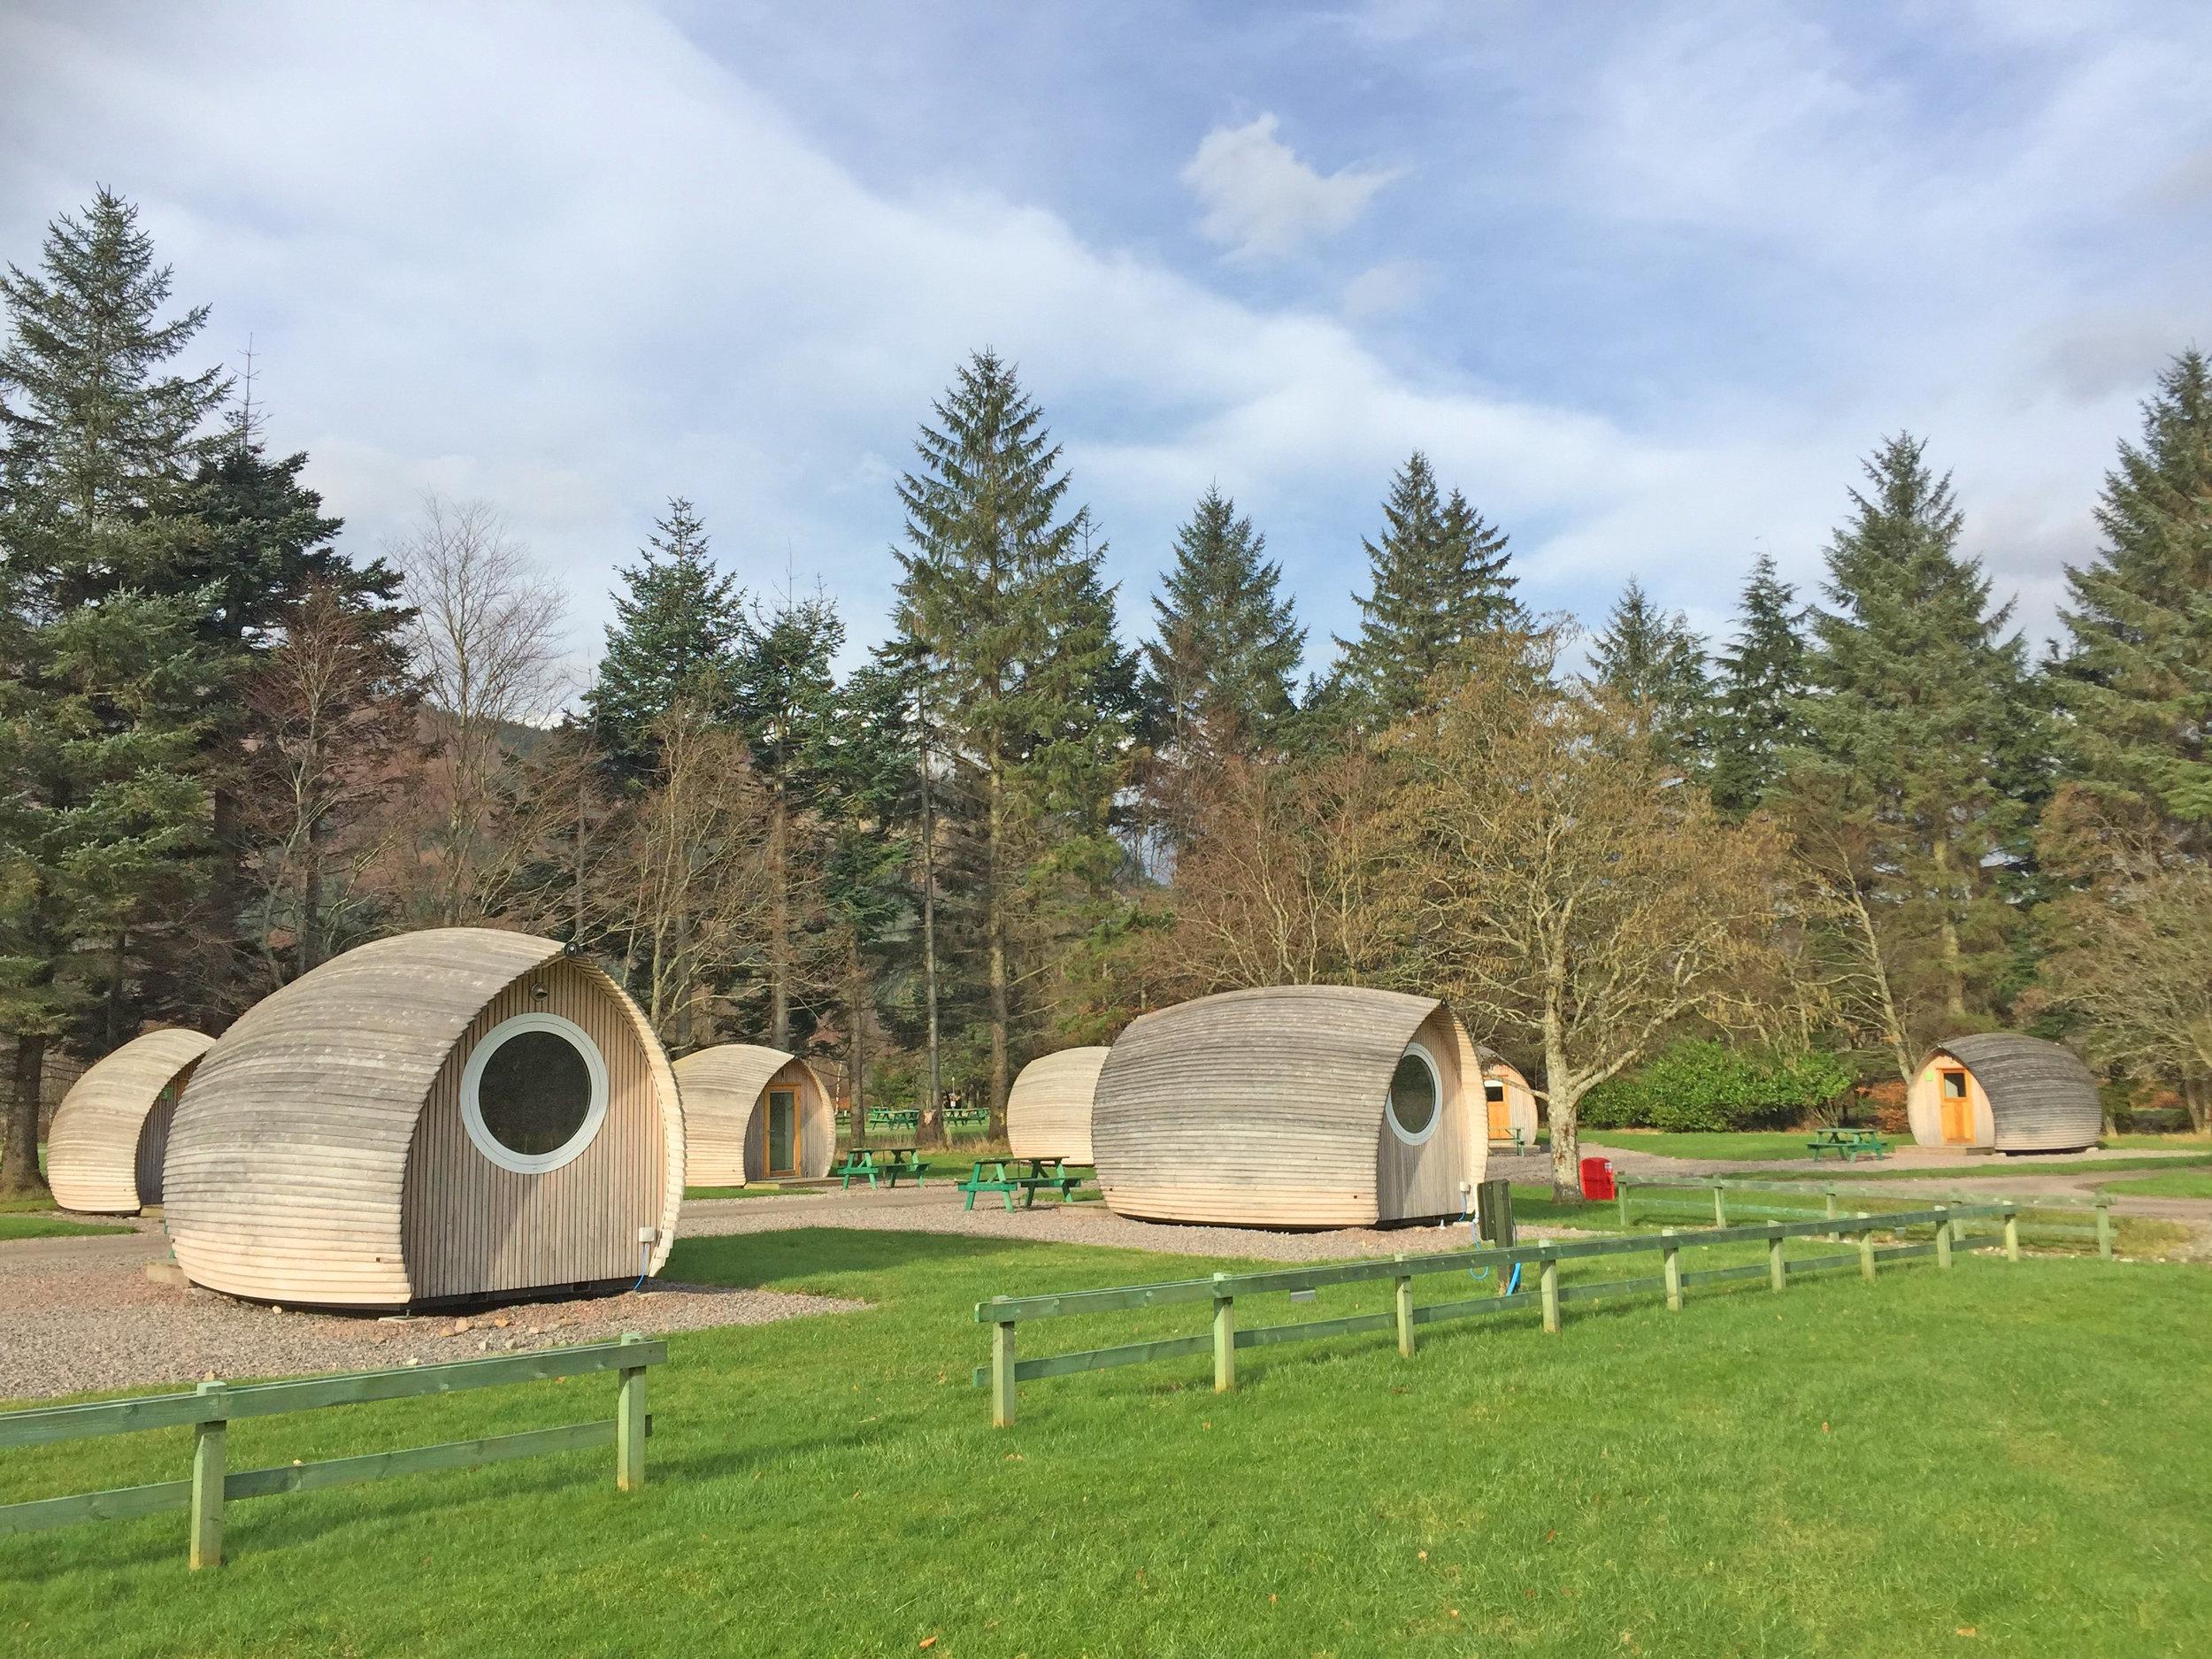 Camping Pods - External